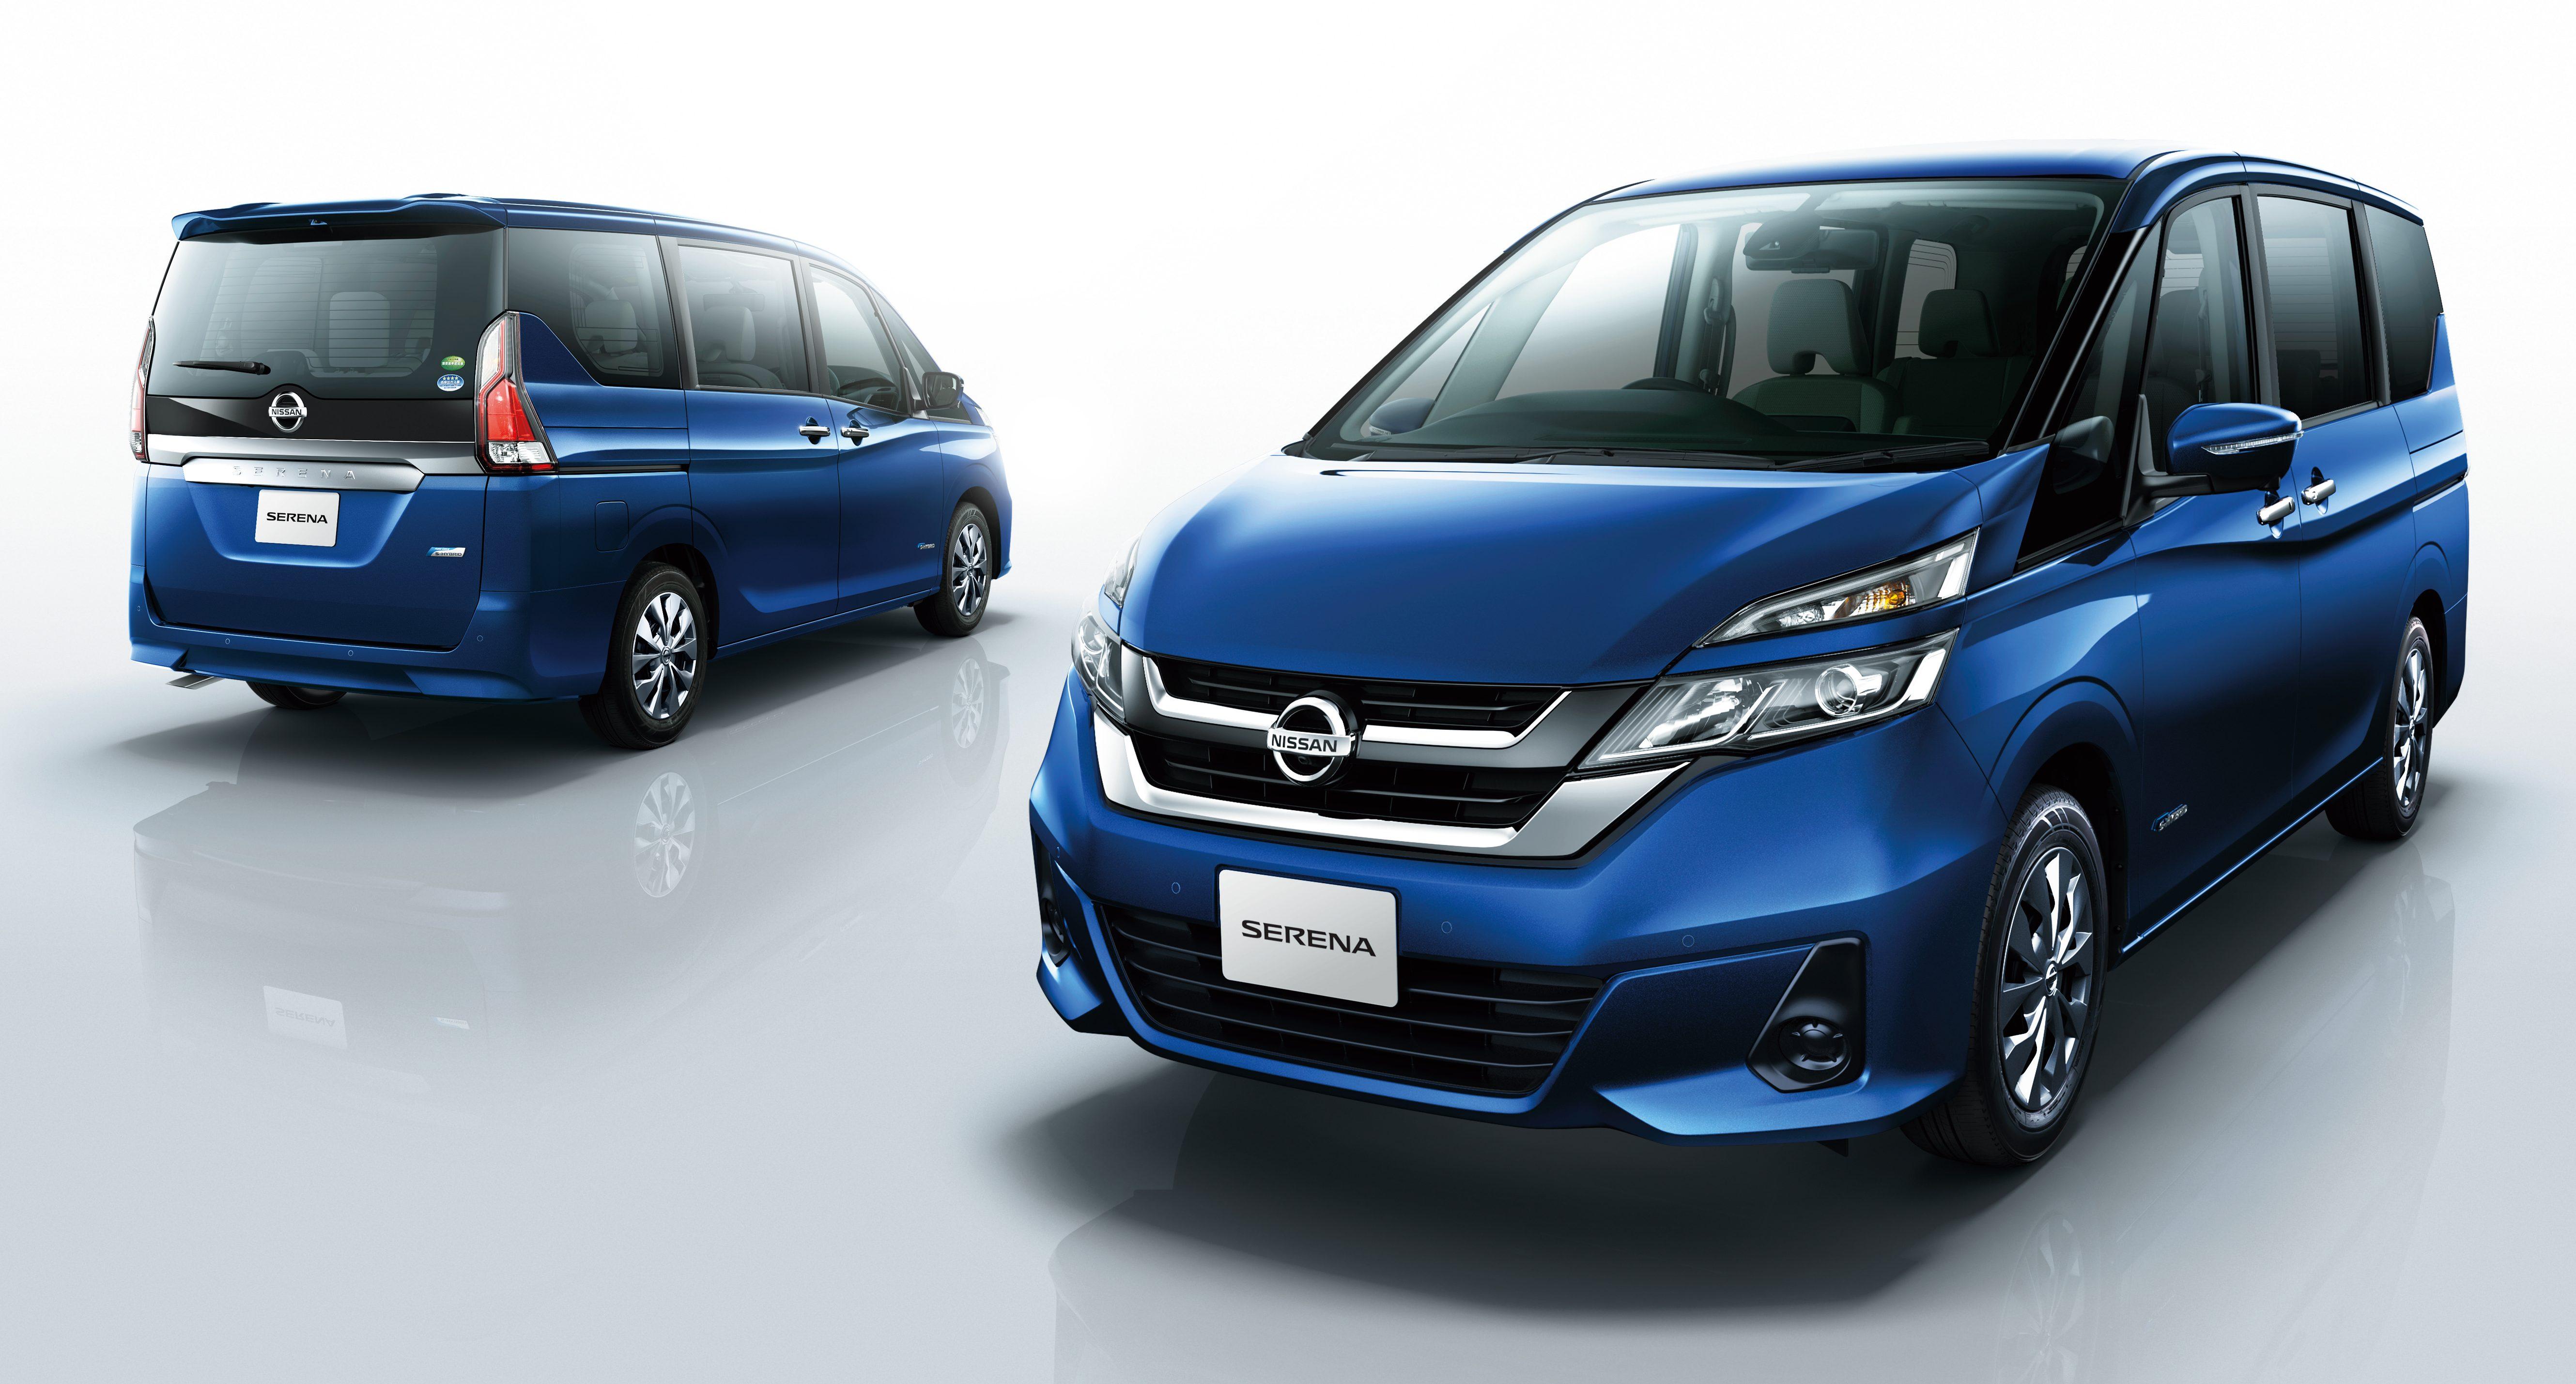 All-new Nissan Serena – fifth-generation model debuts Image 517761